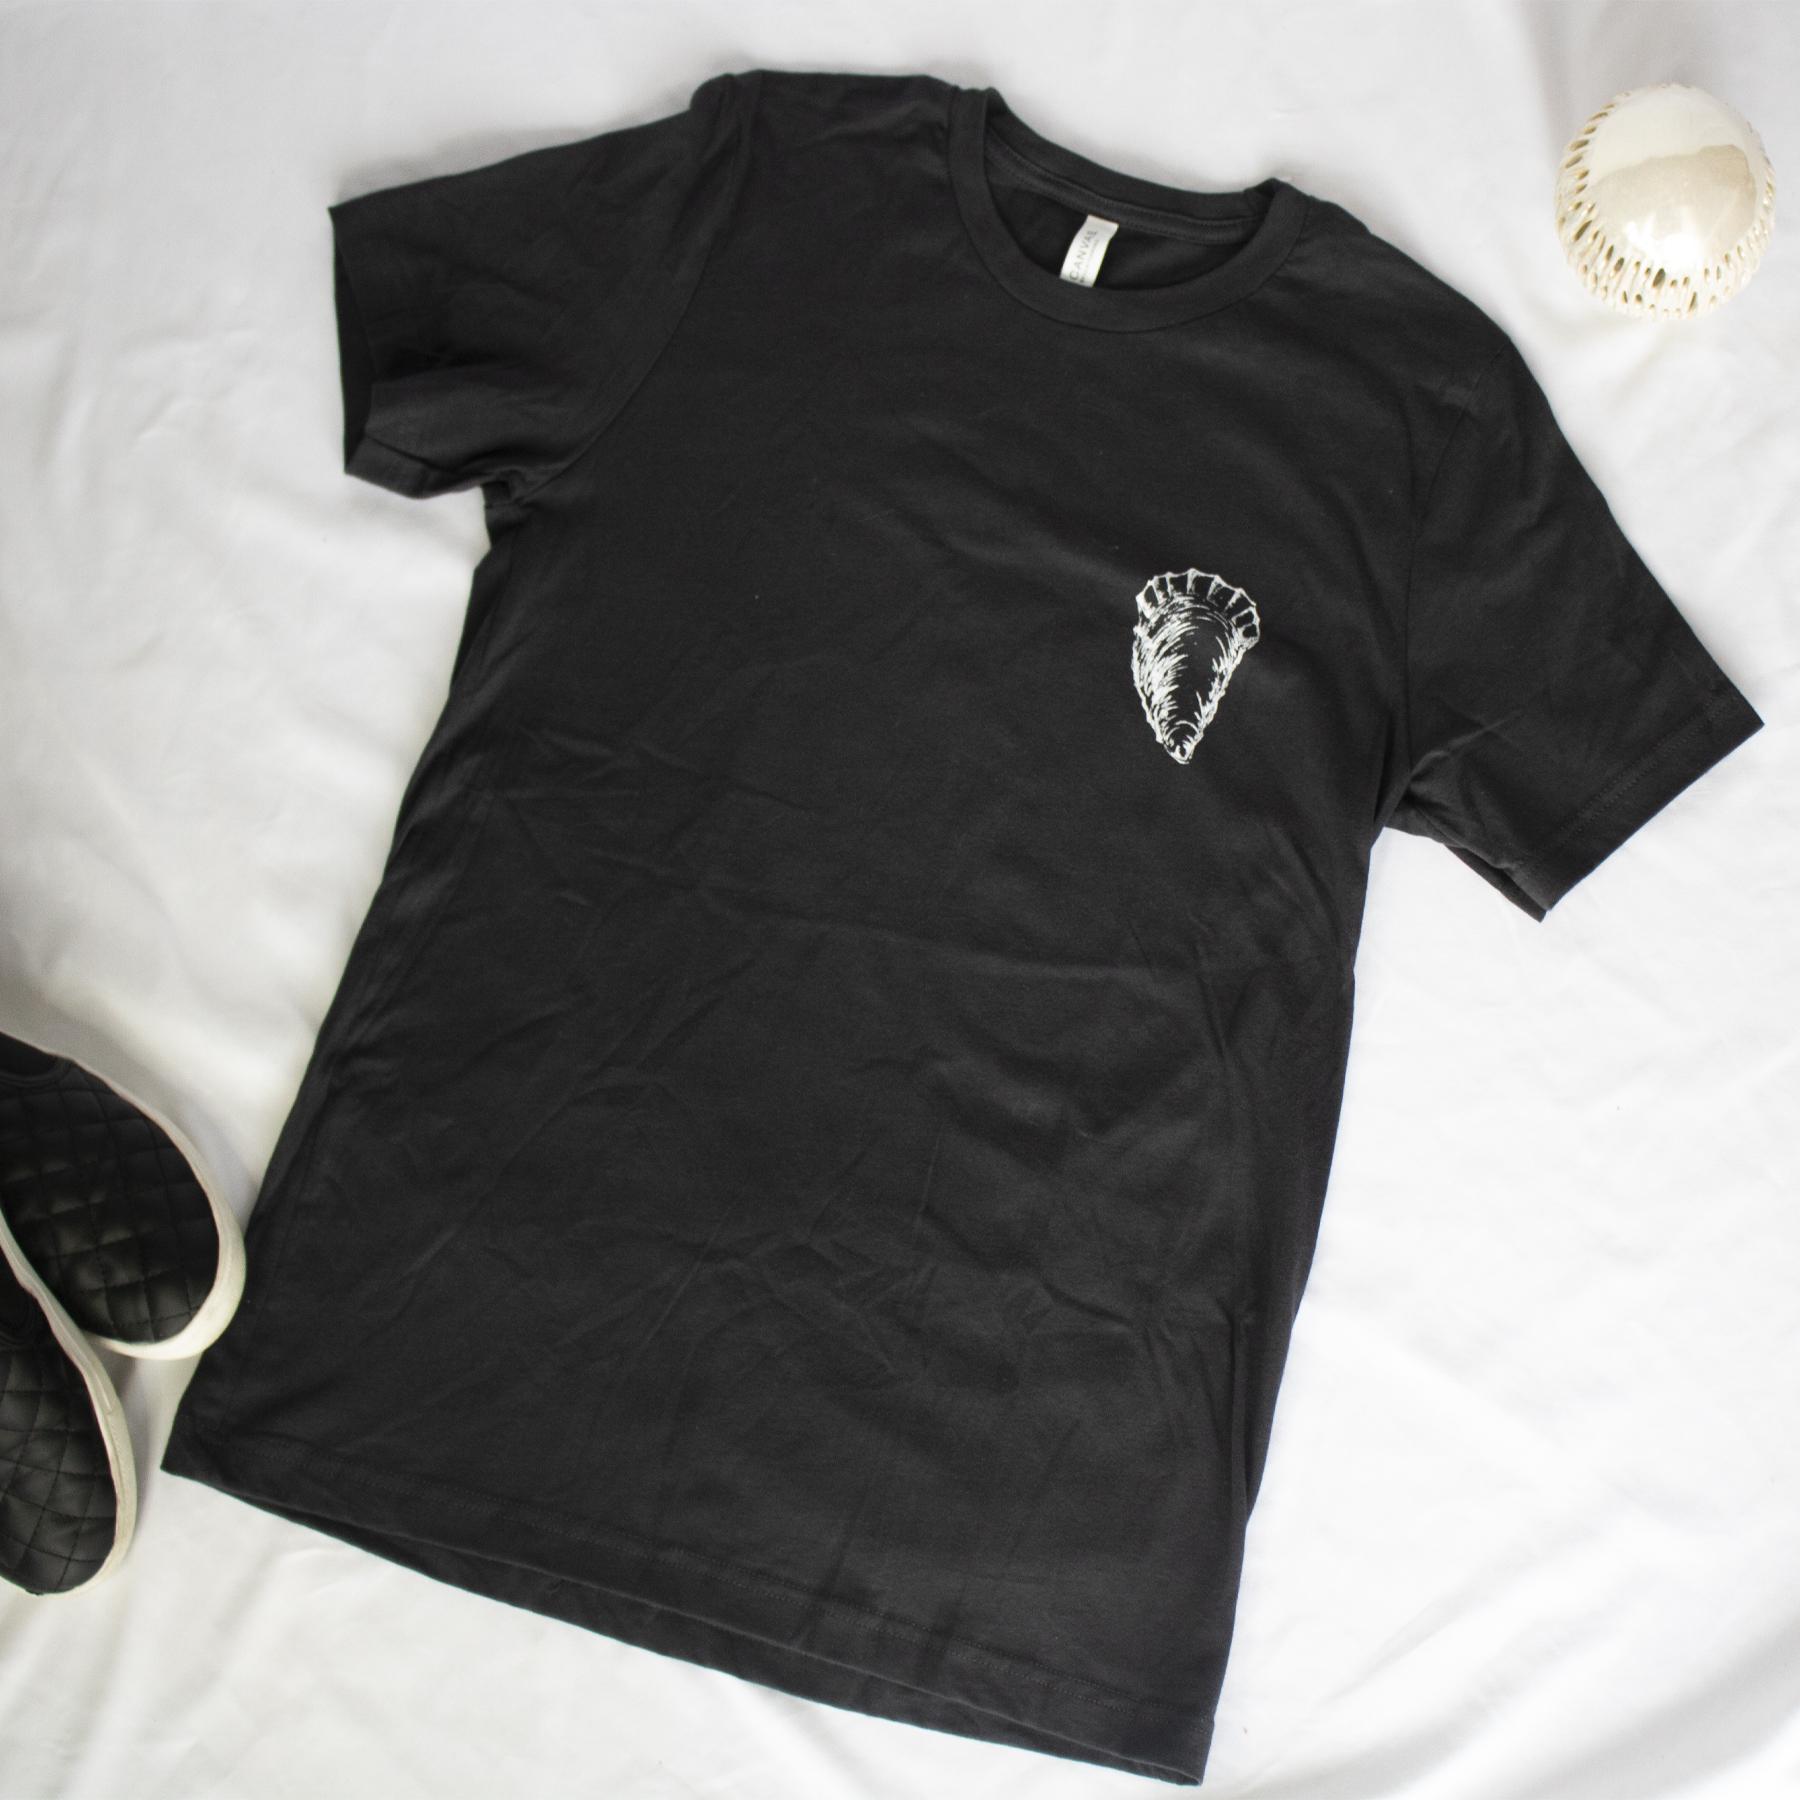 Big Oyster T-Shirt